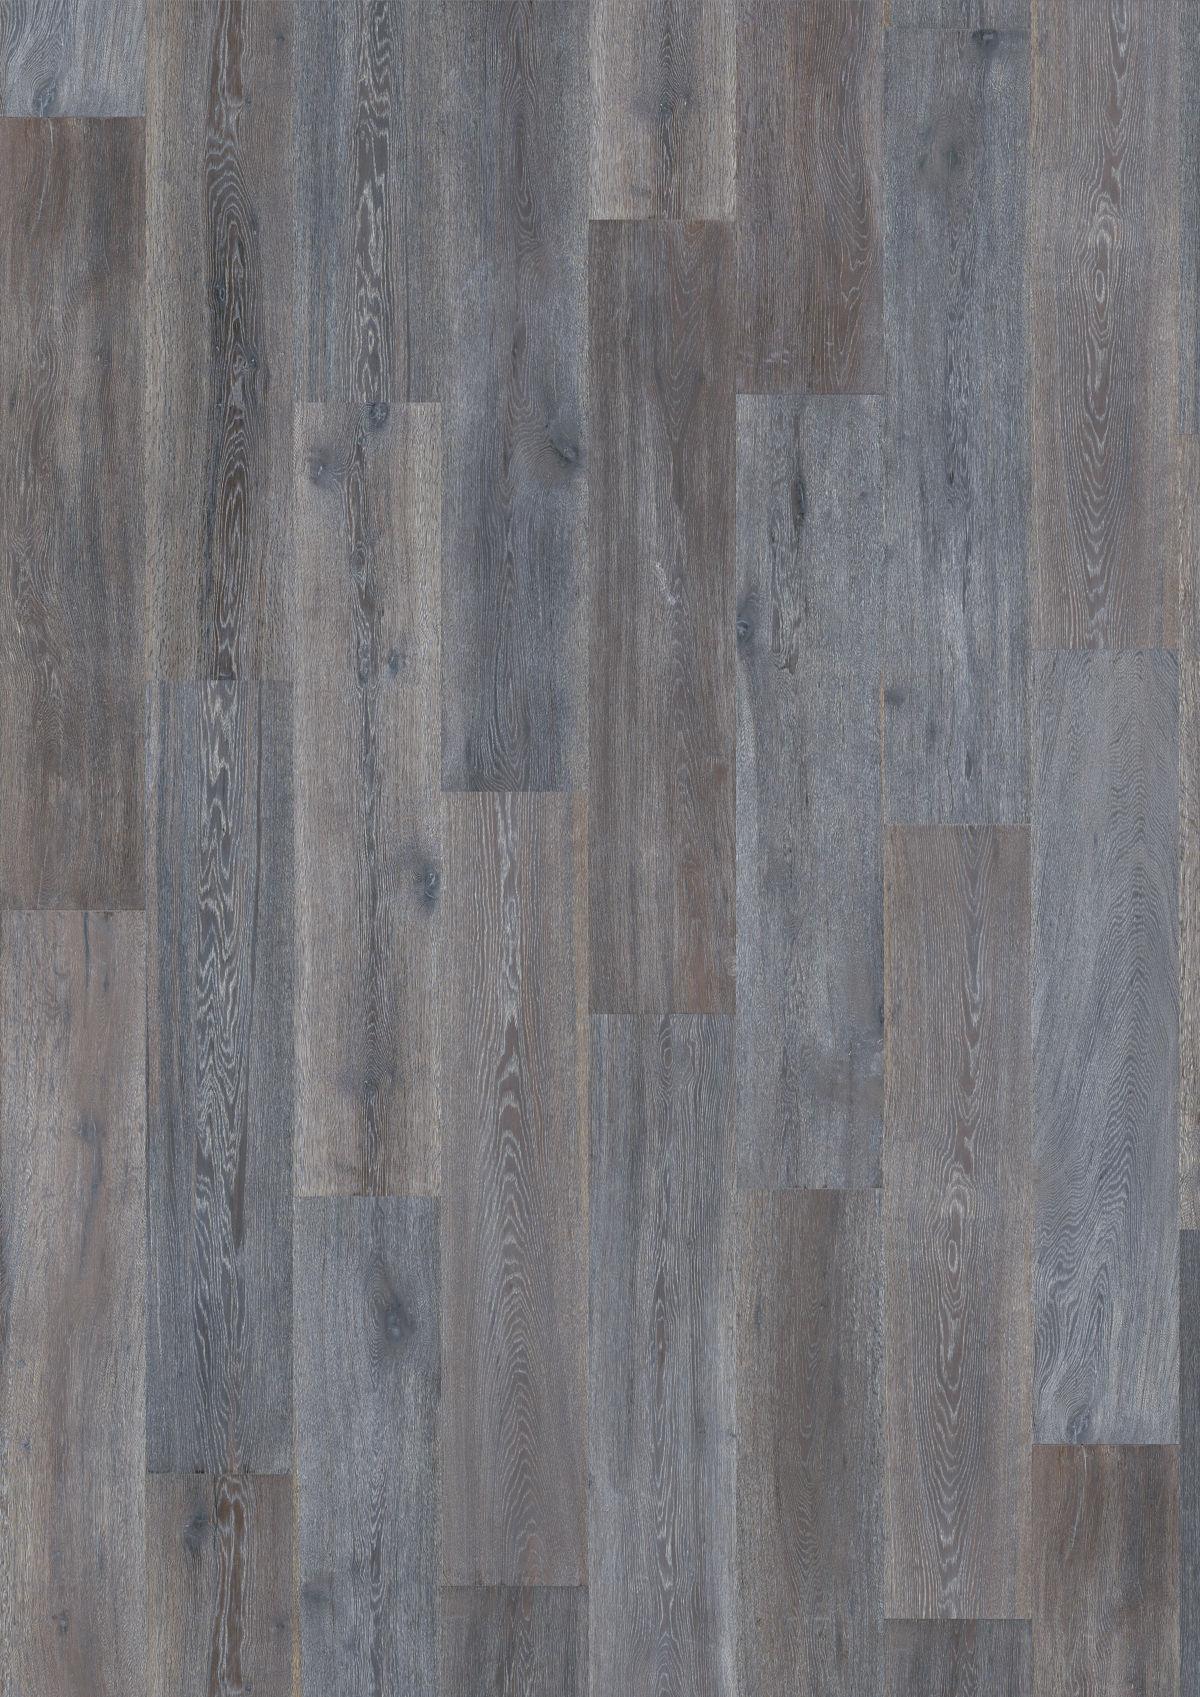 Kahrs oak maison engineered wood flooring for Kahrs hardwood flooring